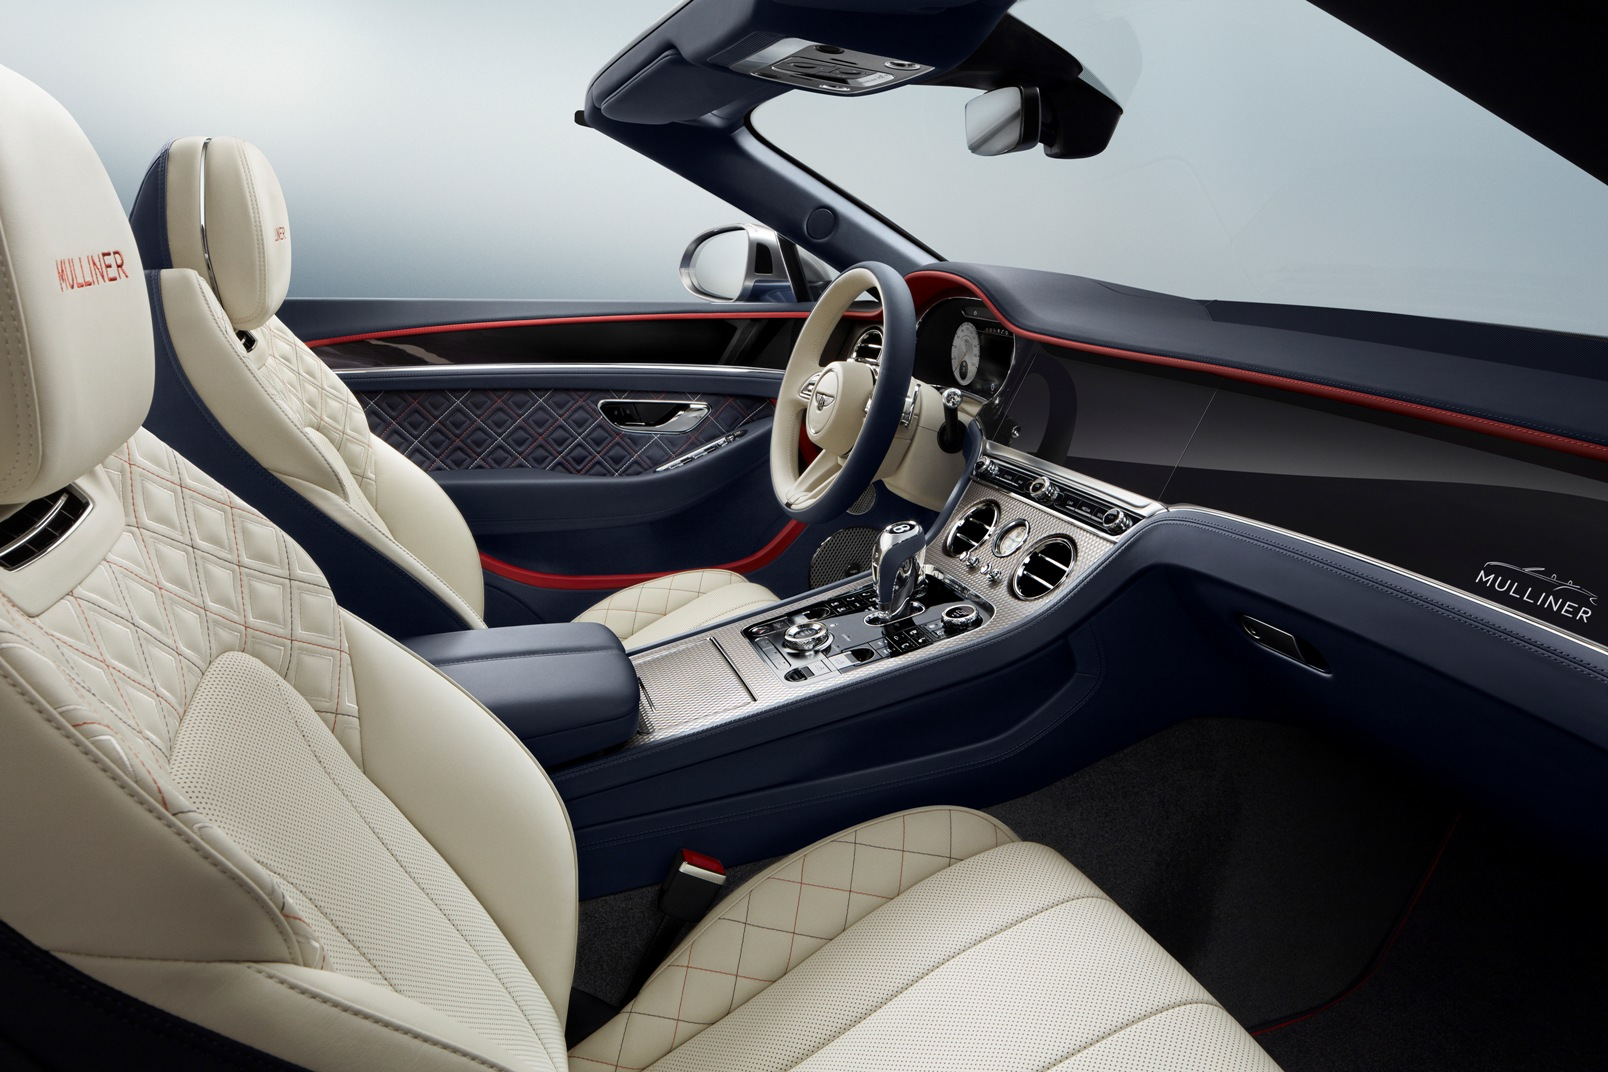 Bentley Continental Gt Mulliner Convertible (5)